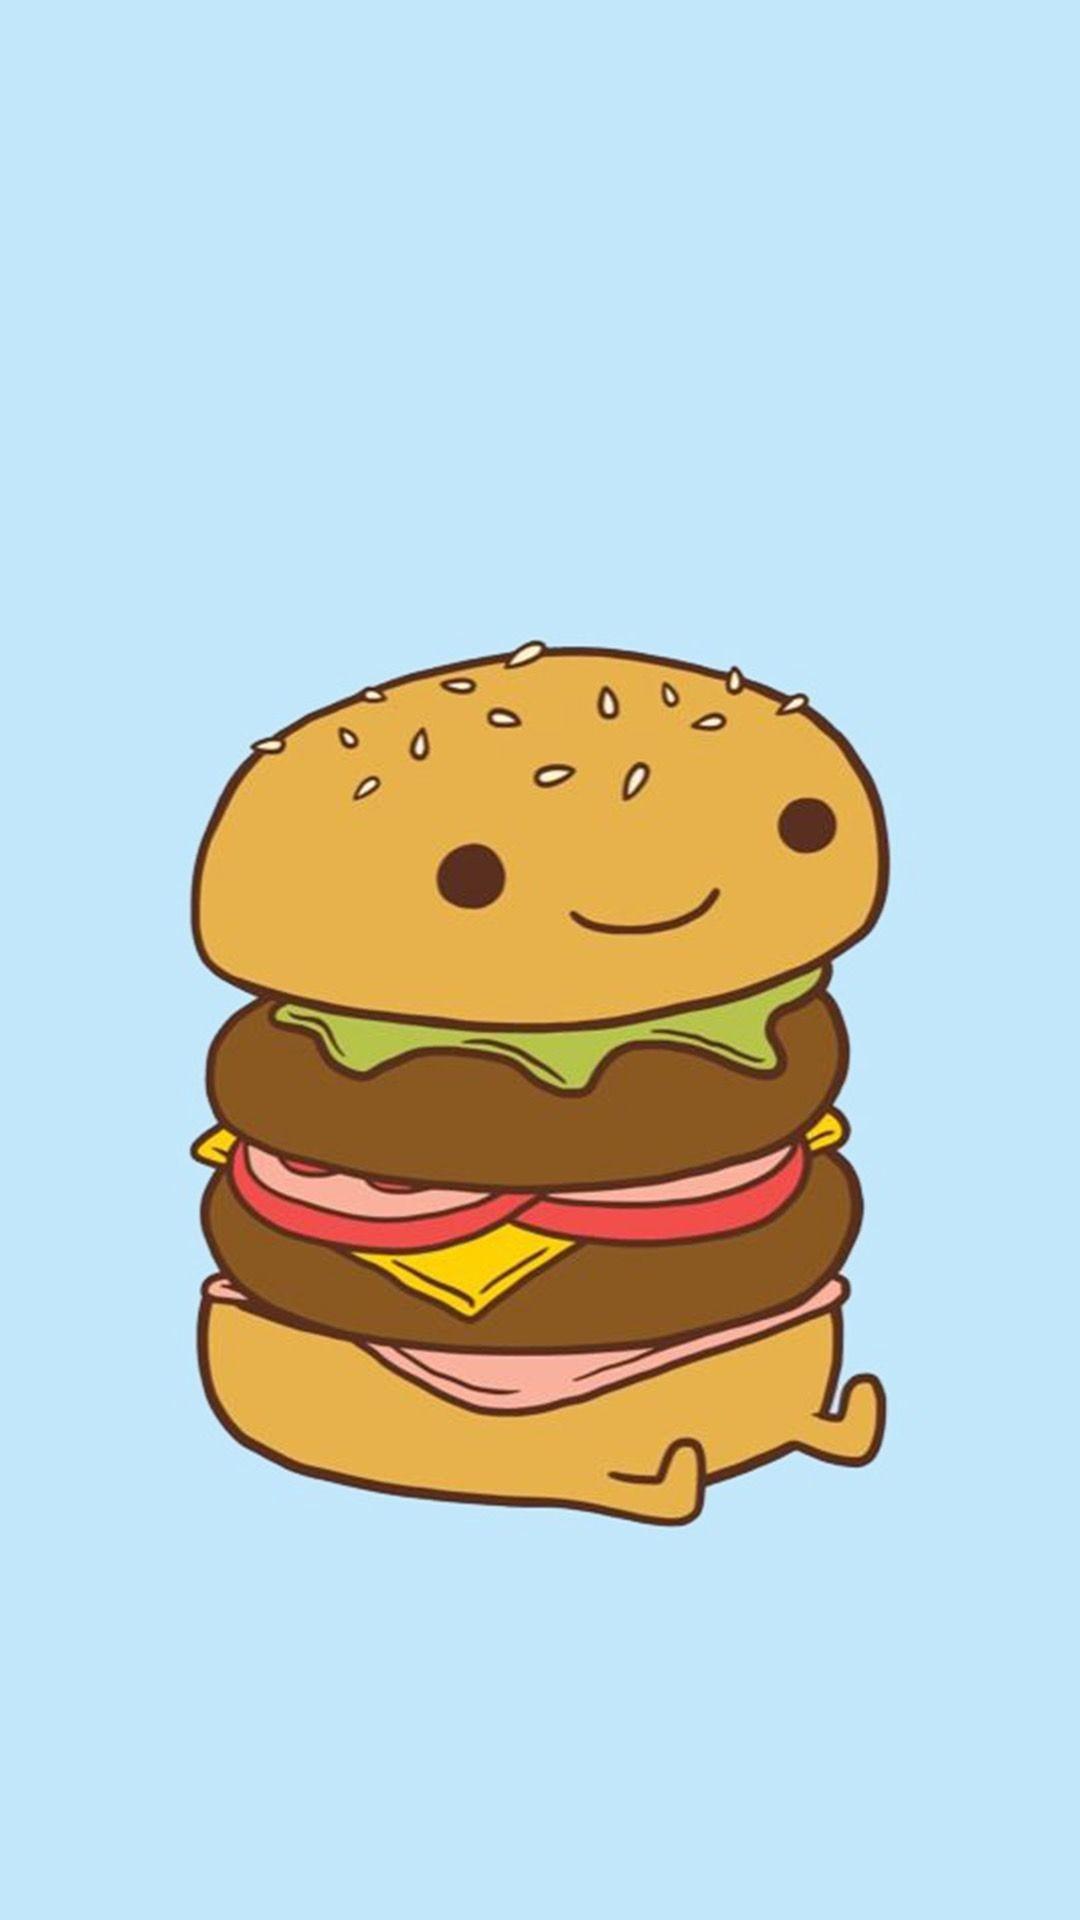 Res: 1080x1920, Da burger